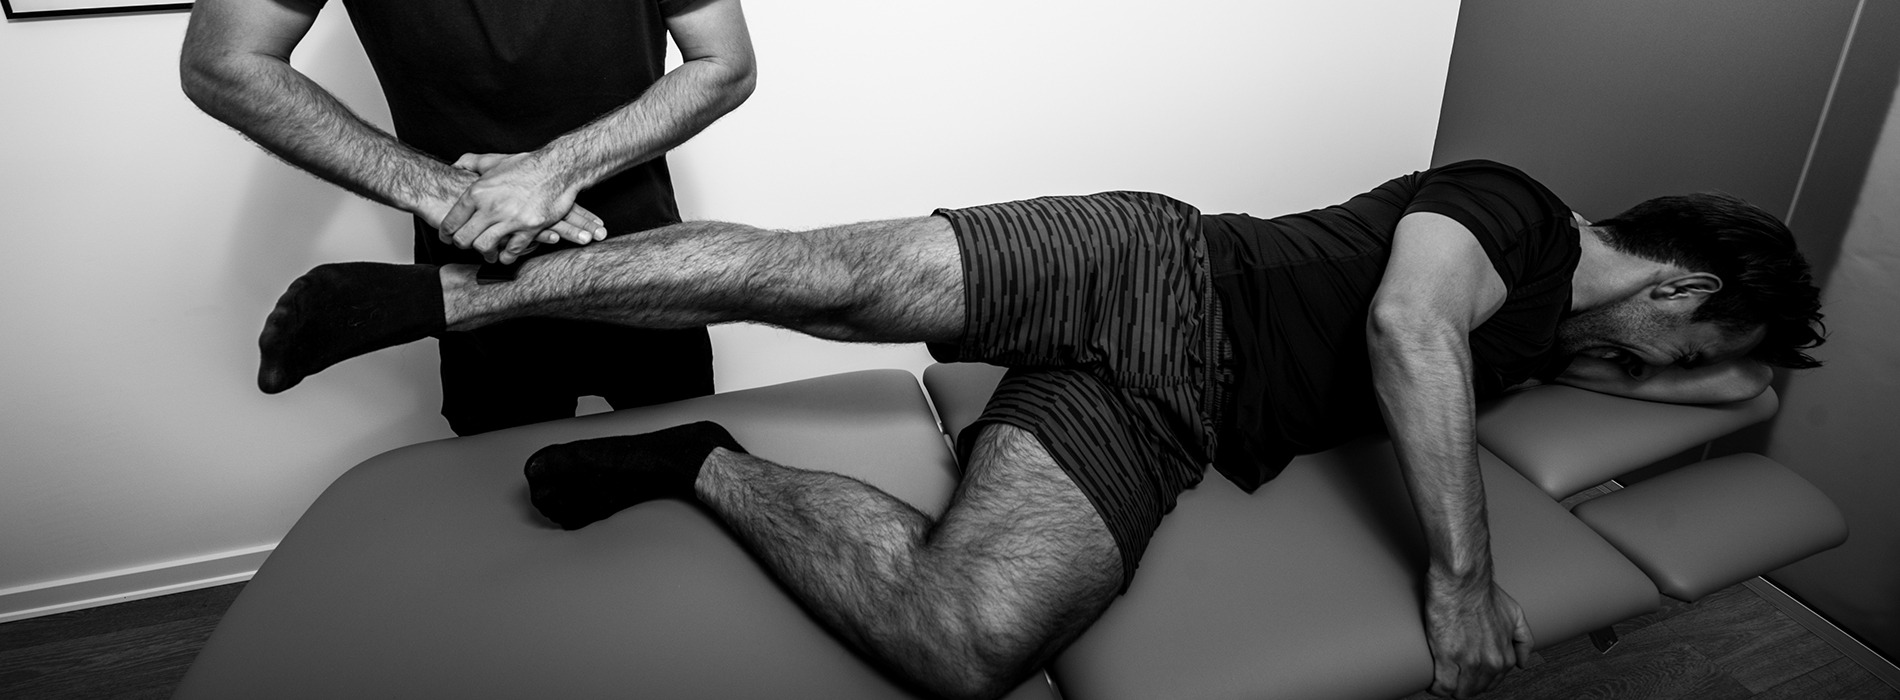 Test af muskler hos Sportsfysioterapien